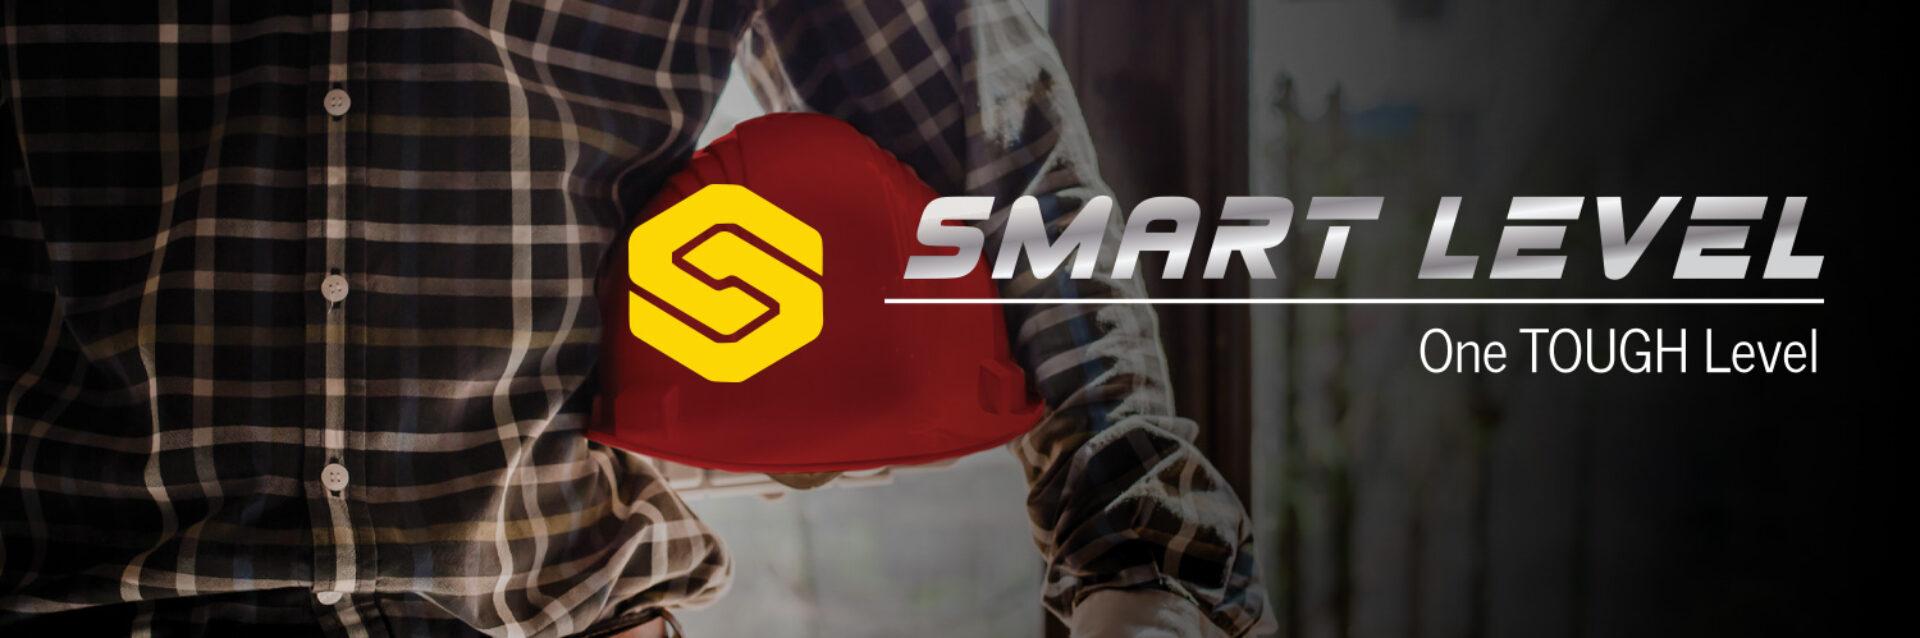 Order Smart Level